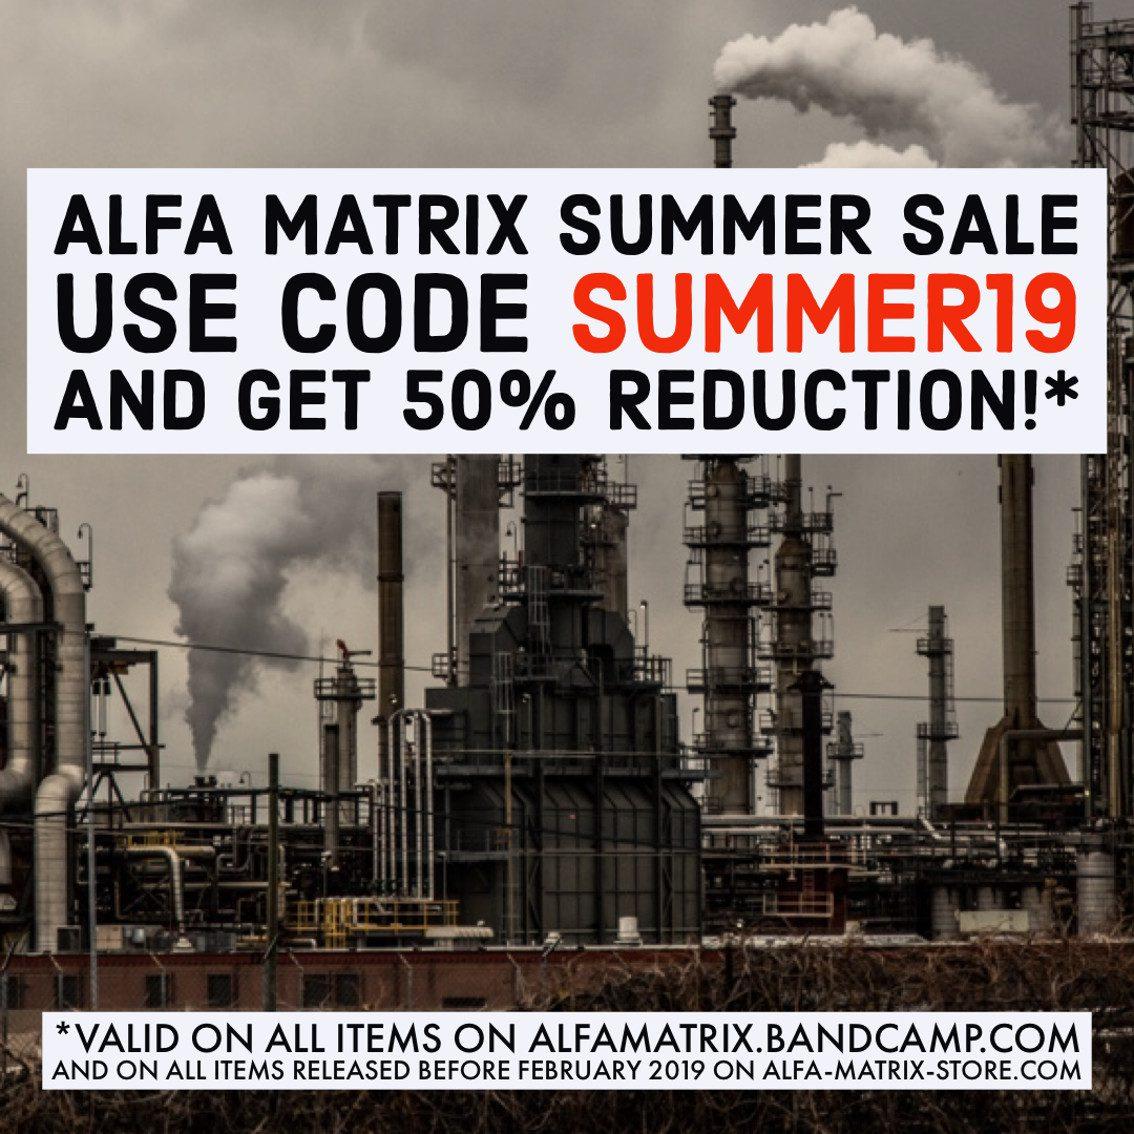 Alfa Matrix launches massive sale: 50% reduction on over 400 releases